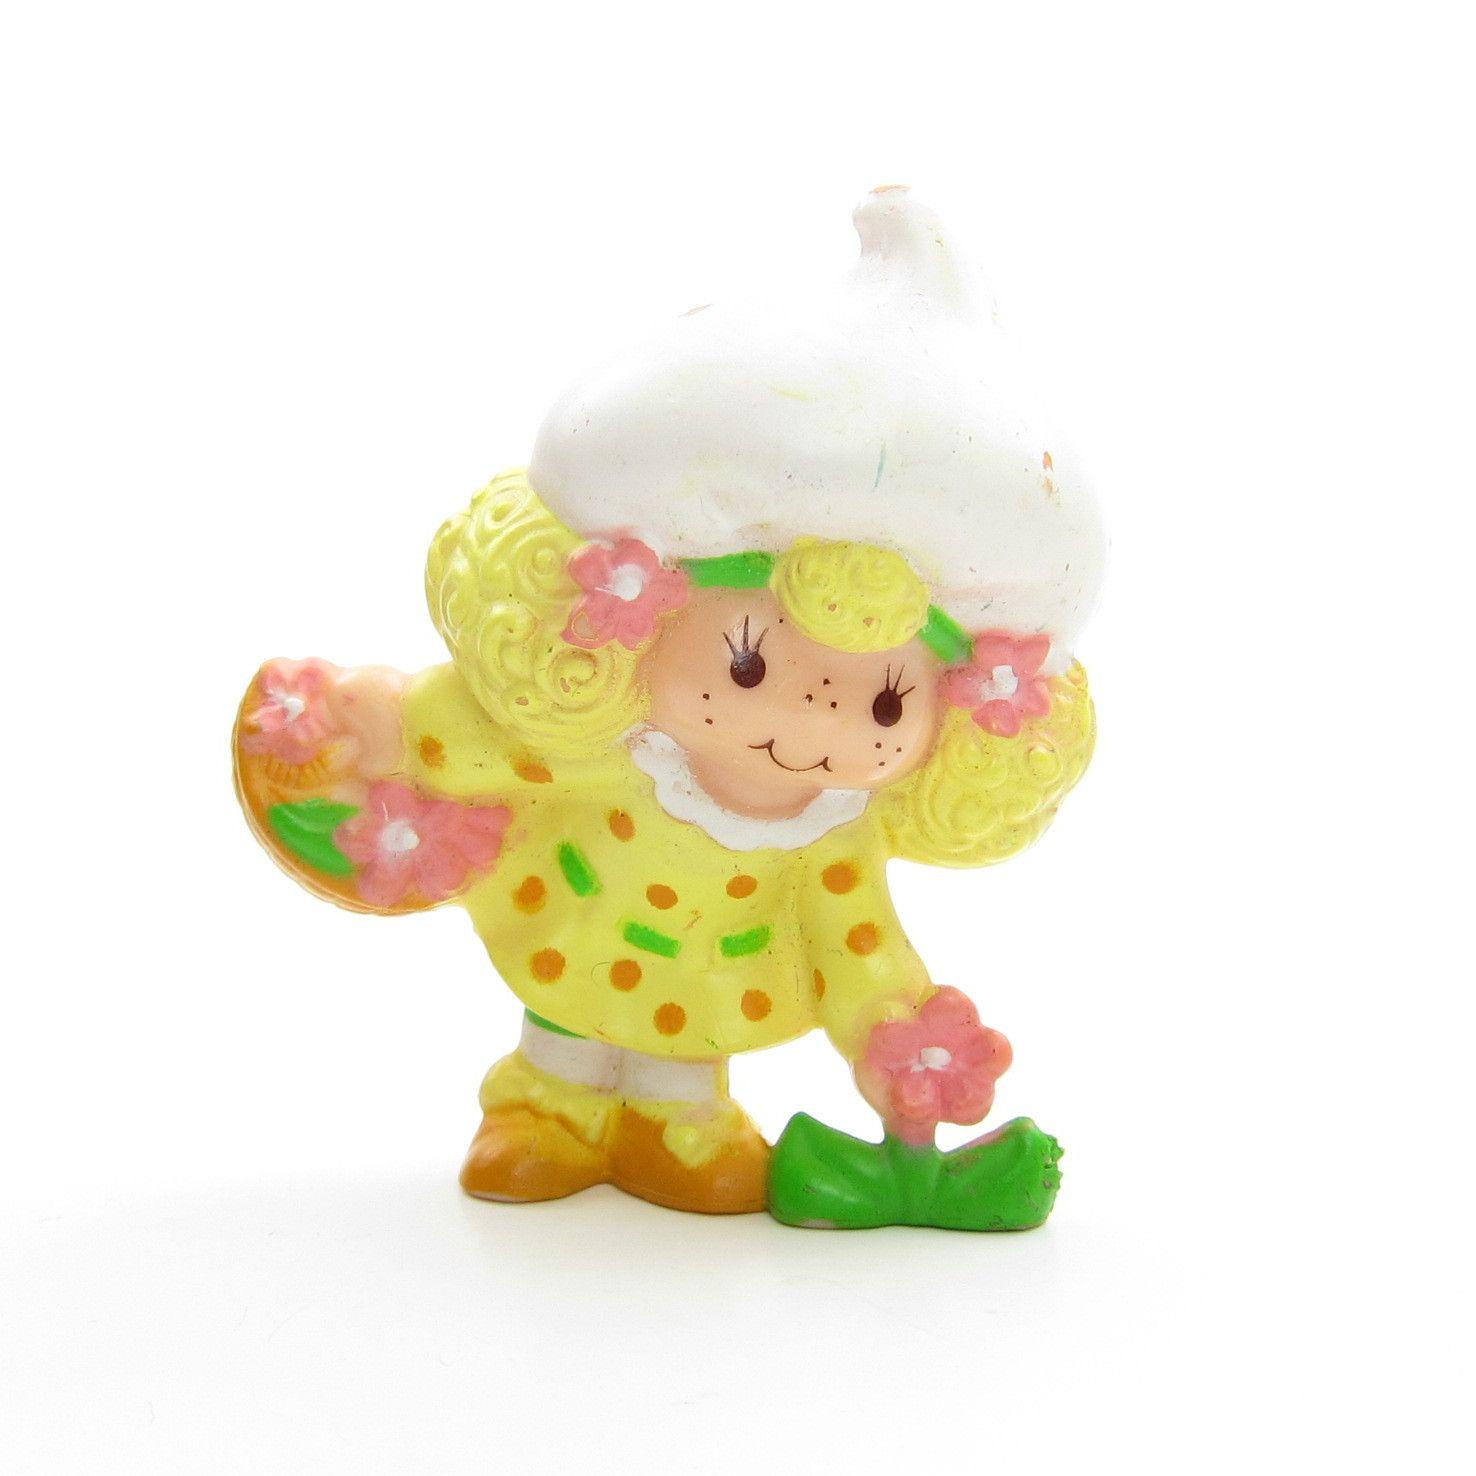 LEMON MERINGUE Original vintage Strawberry Shortcake Doll